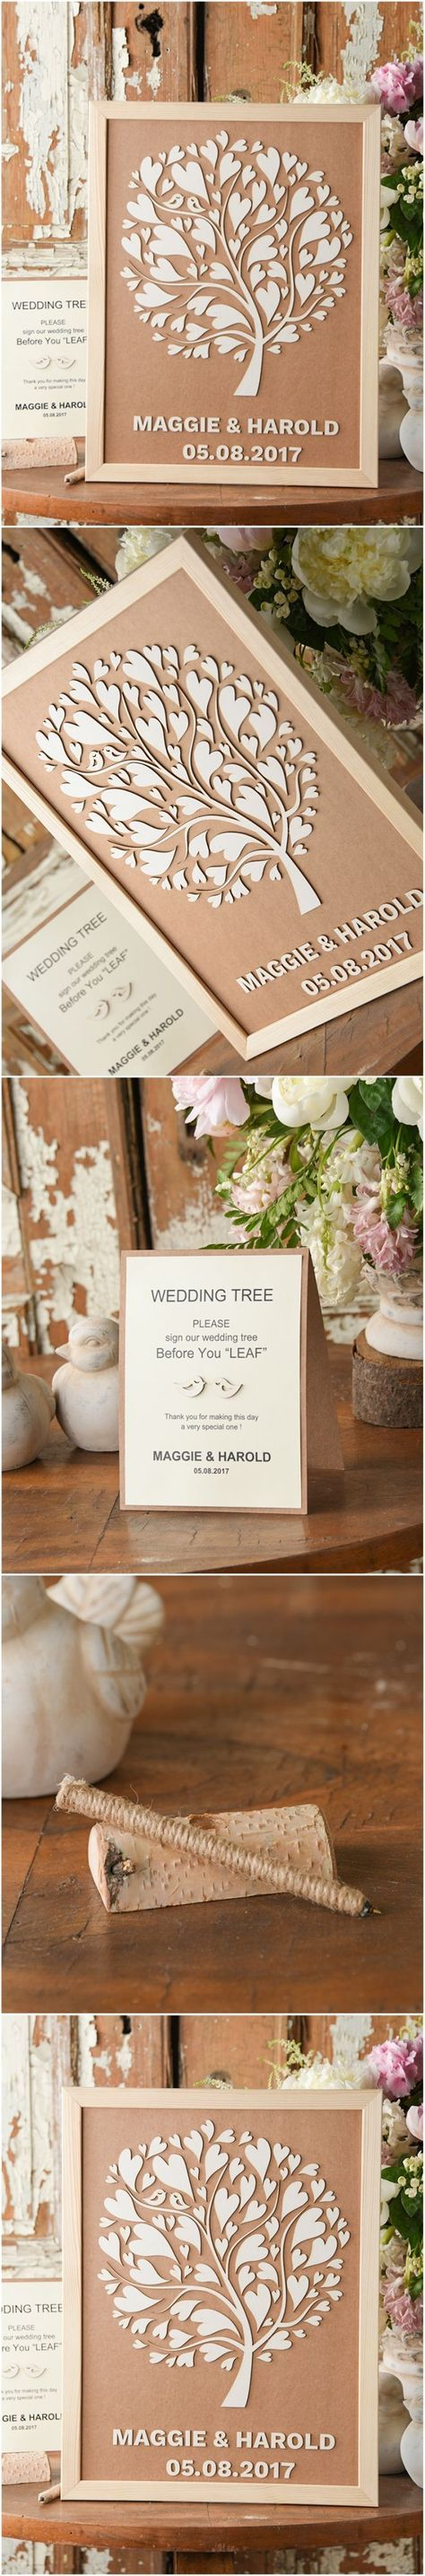 WEDDING GUEST BOOKS Alternative 32 best Outdoor